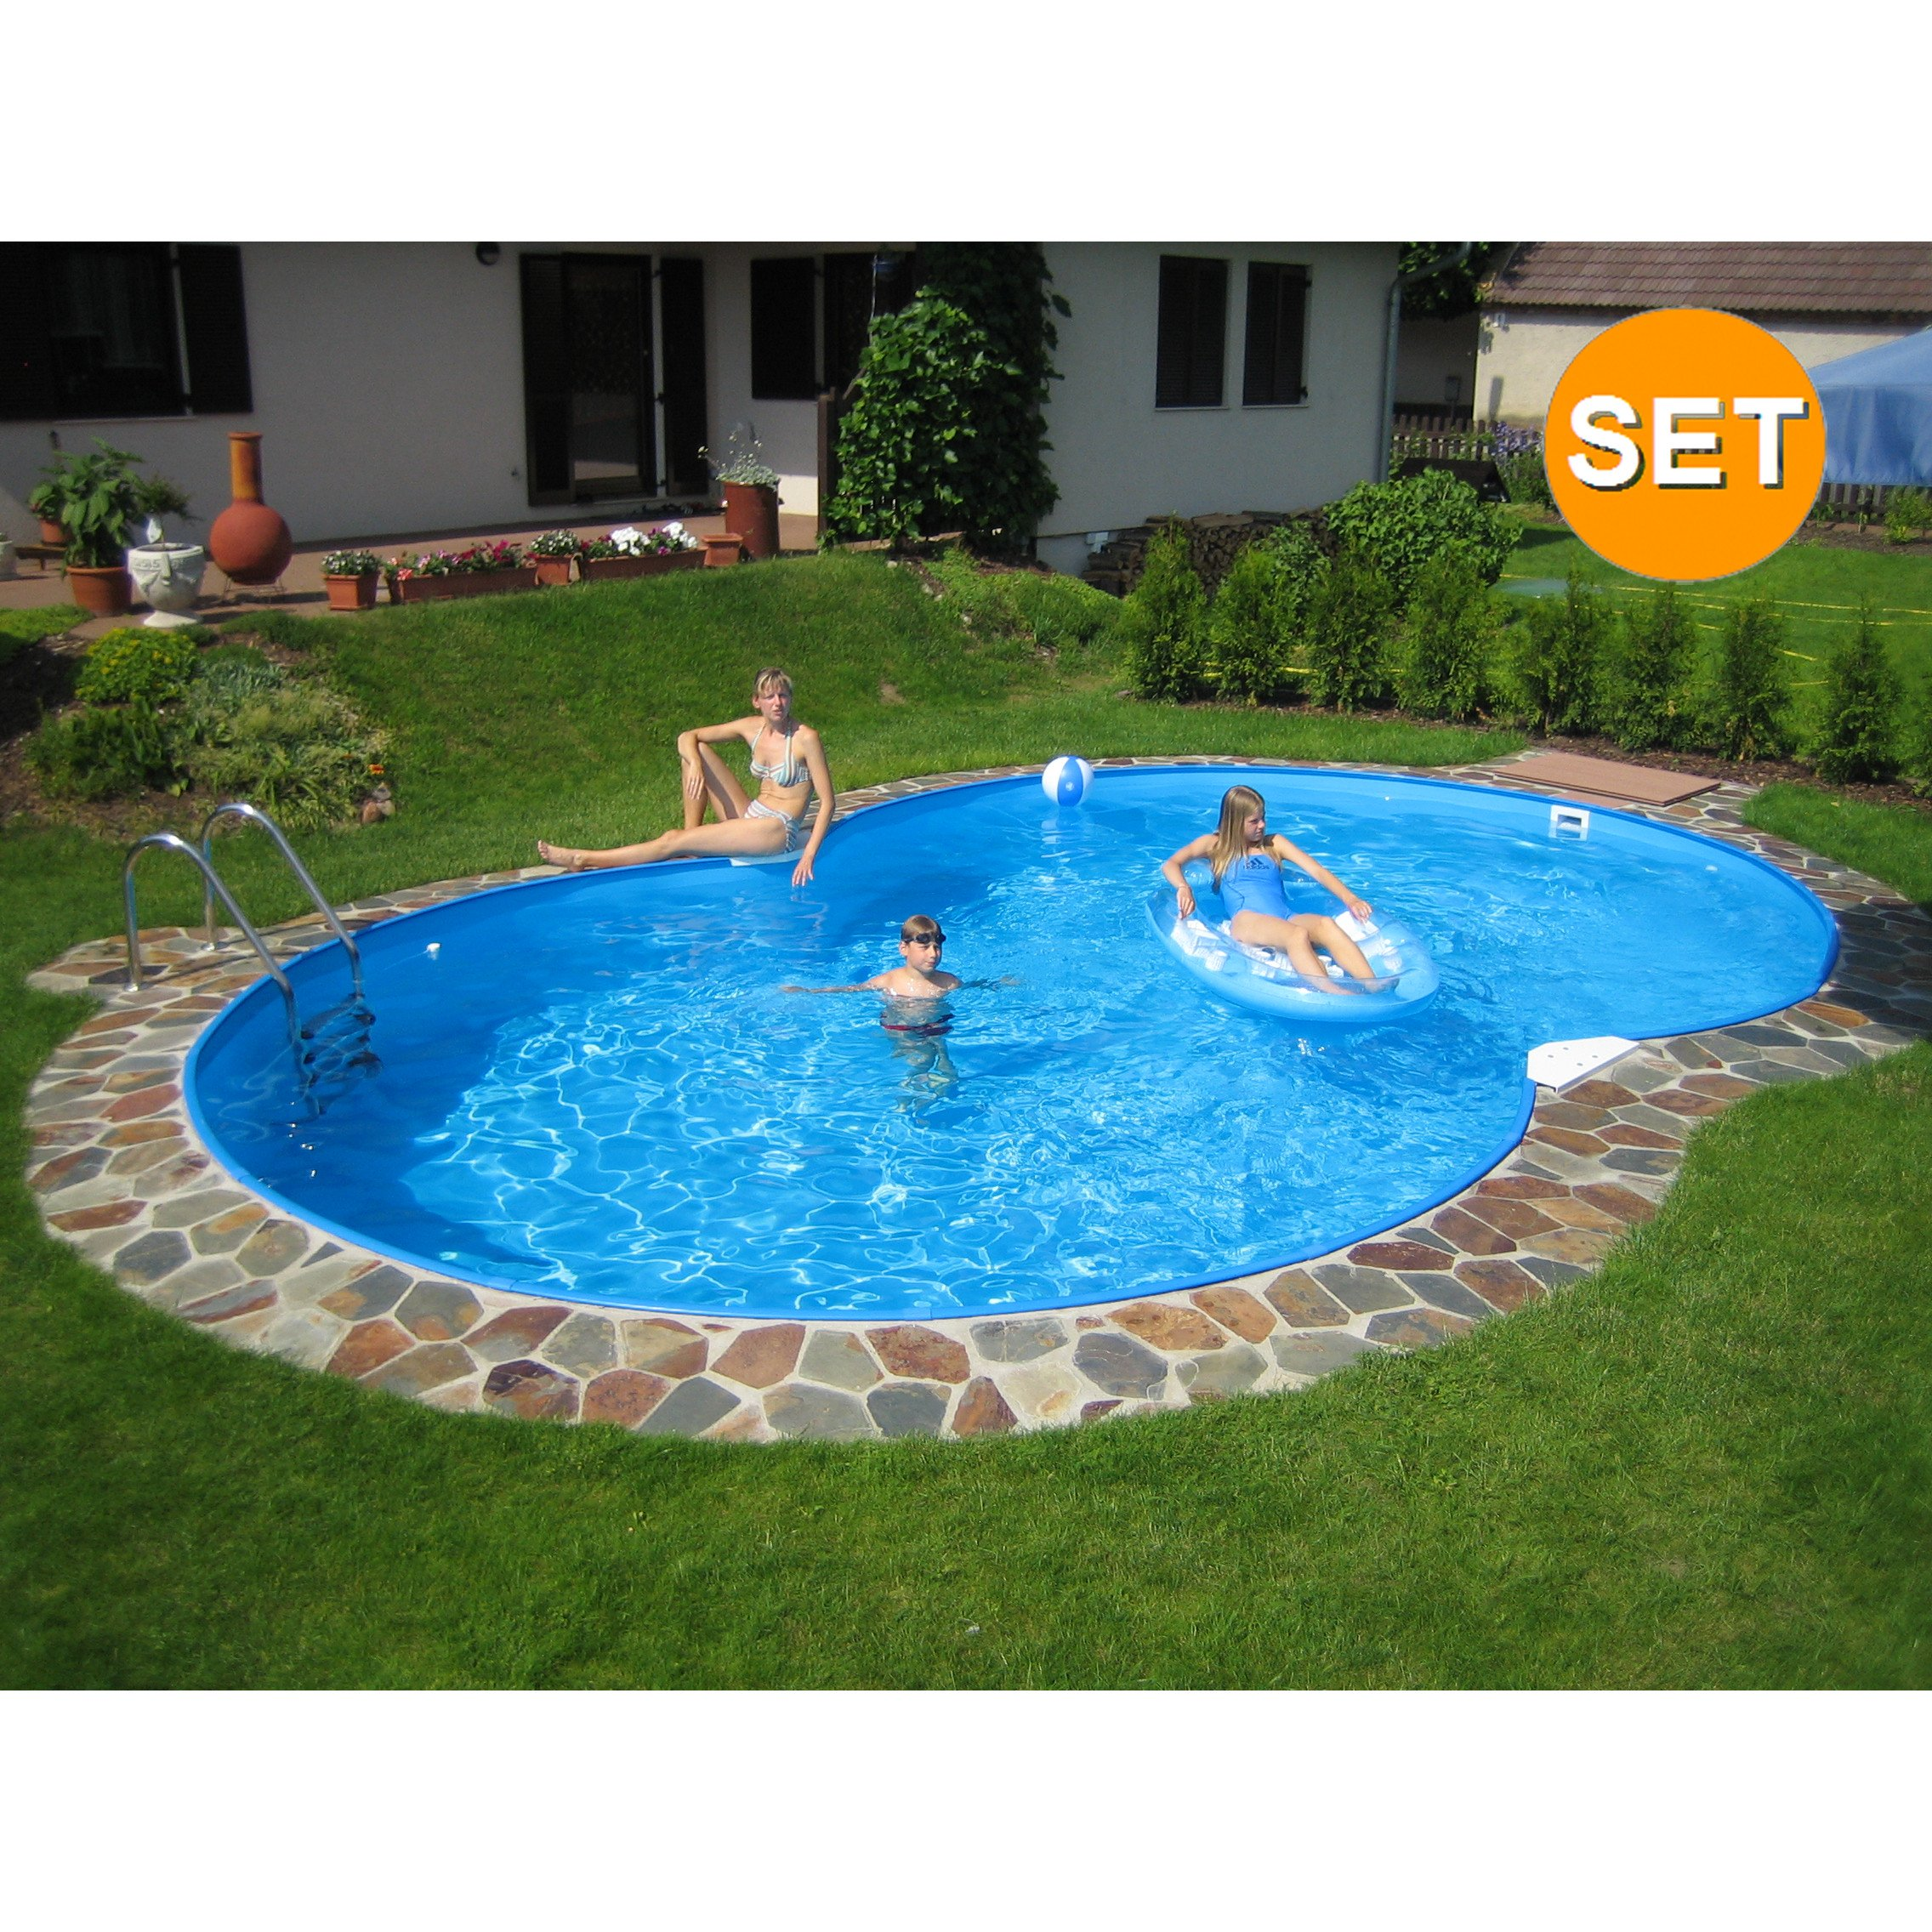 family achtform pool 650 x 420 x 120 cm komplettset. Black Bedroom Furniture Sets. Home Design Ideas